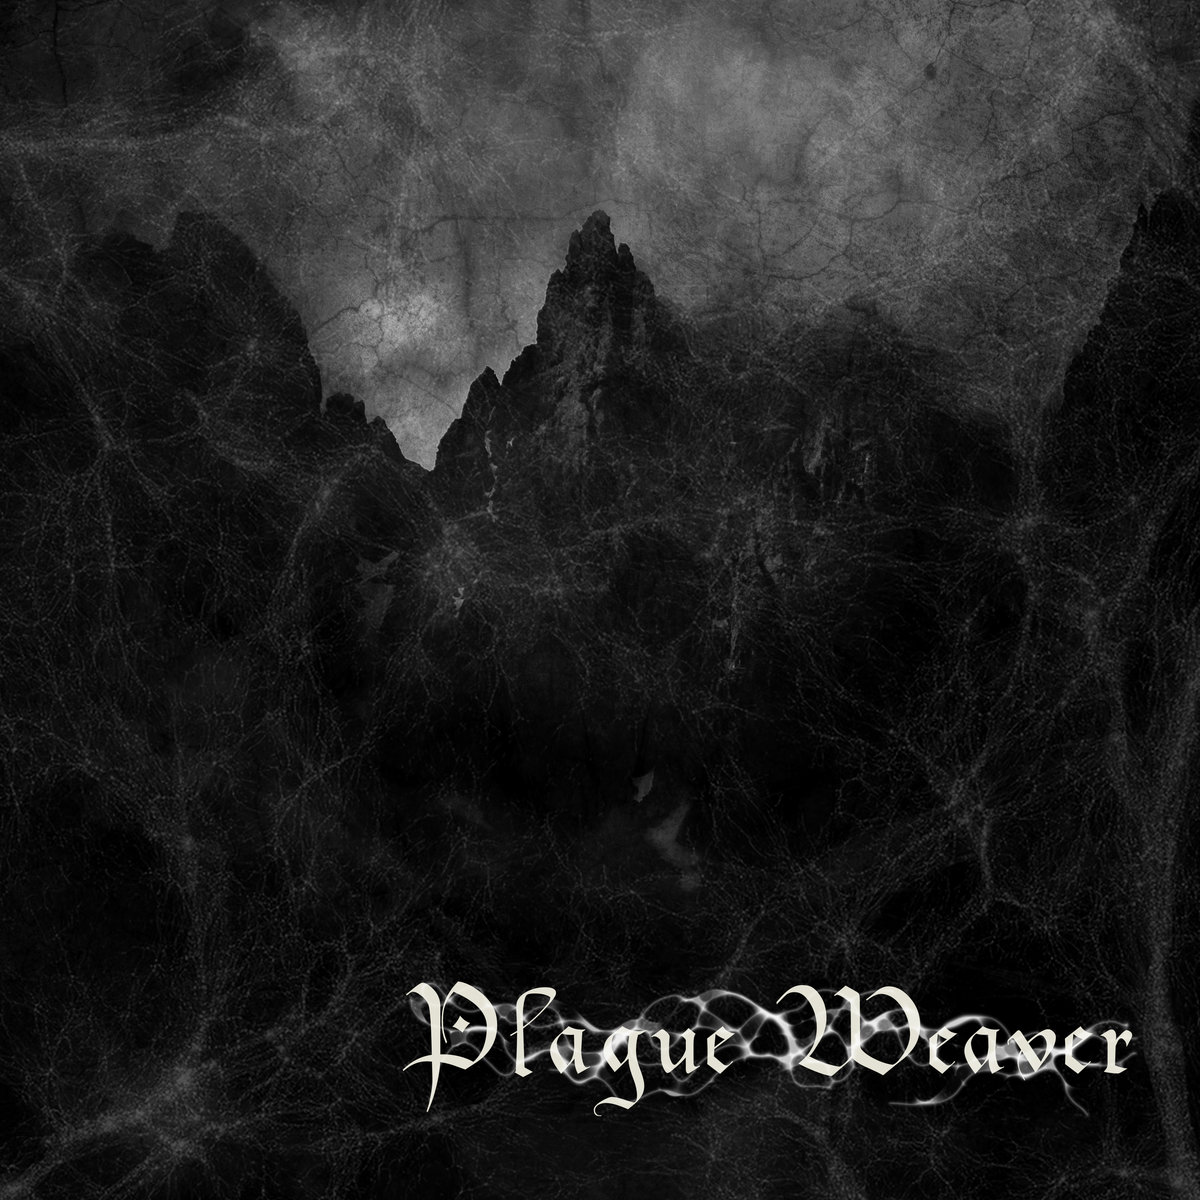 Plagueweaver - virulent blackened doom